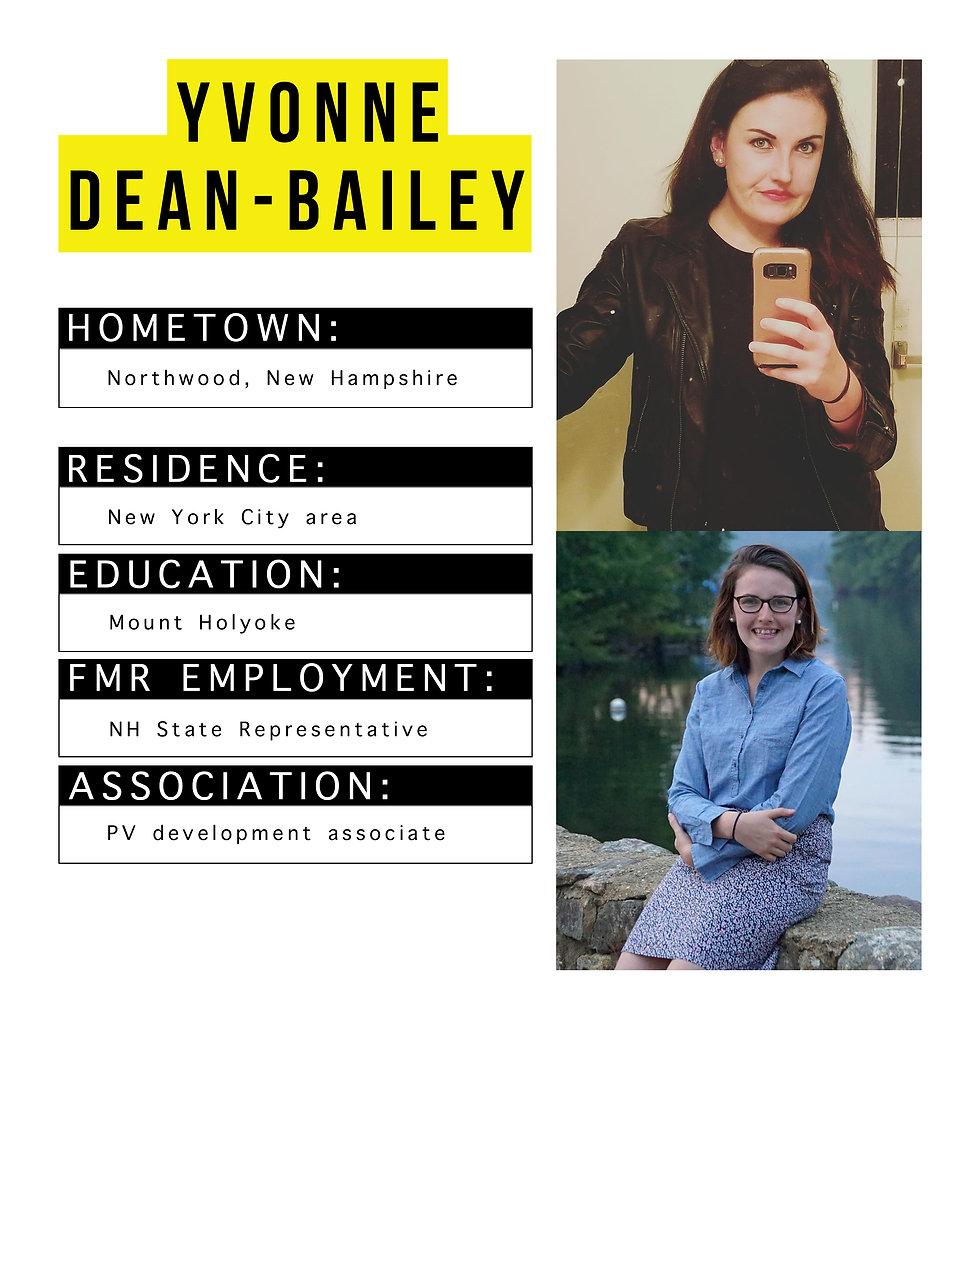 Yvonne Dean-Bailey.jpg